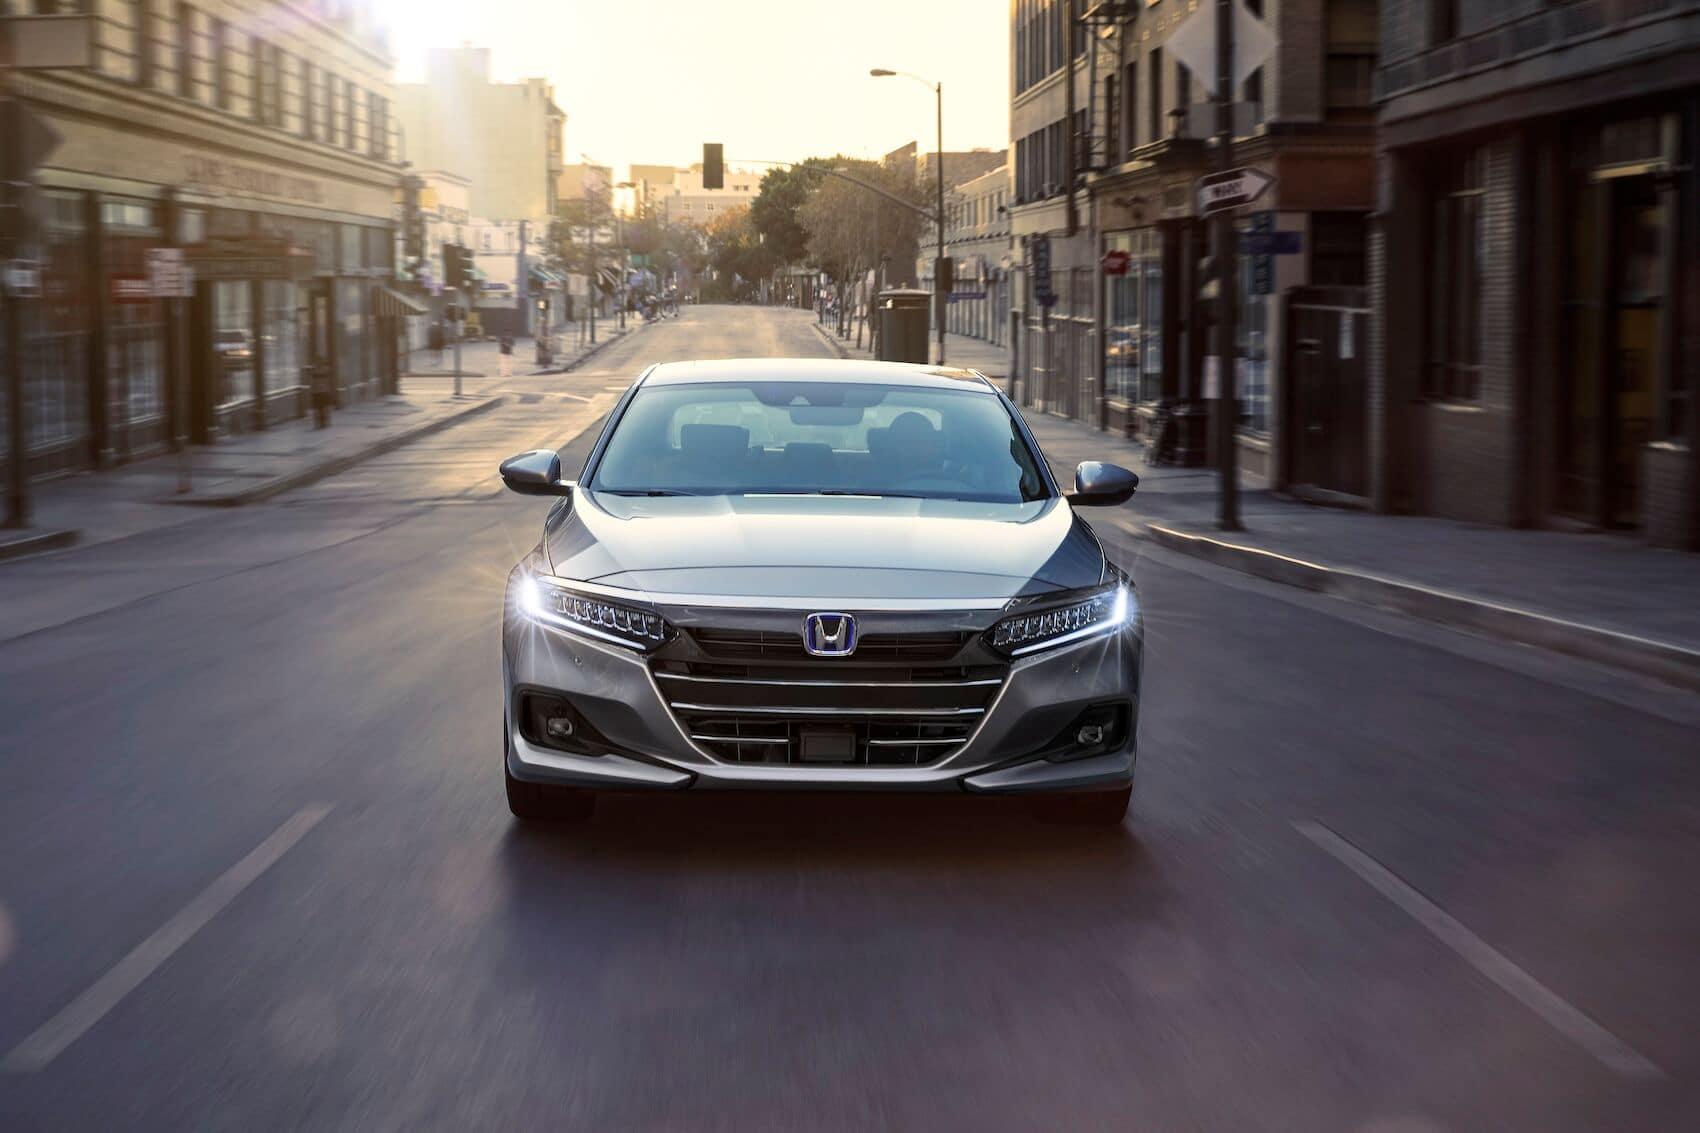 Honda Accord: Engine & Performance